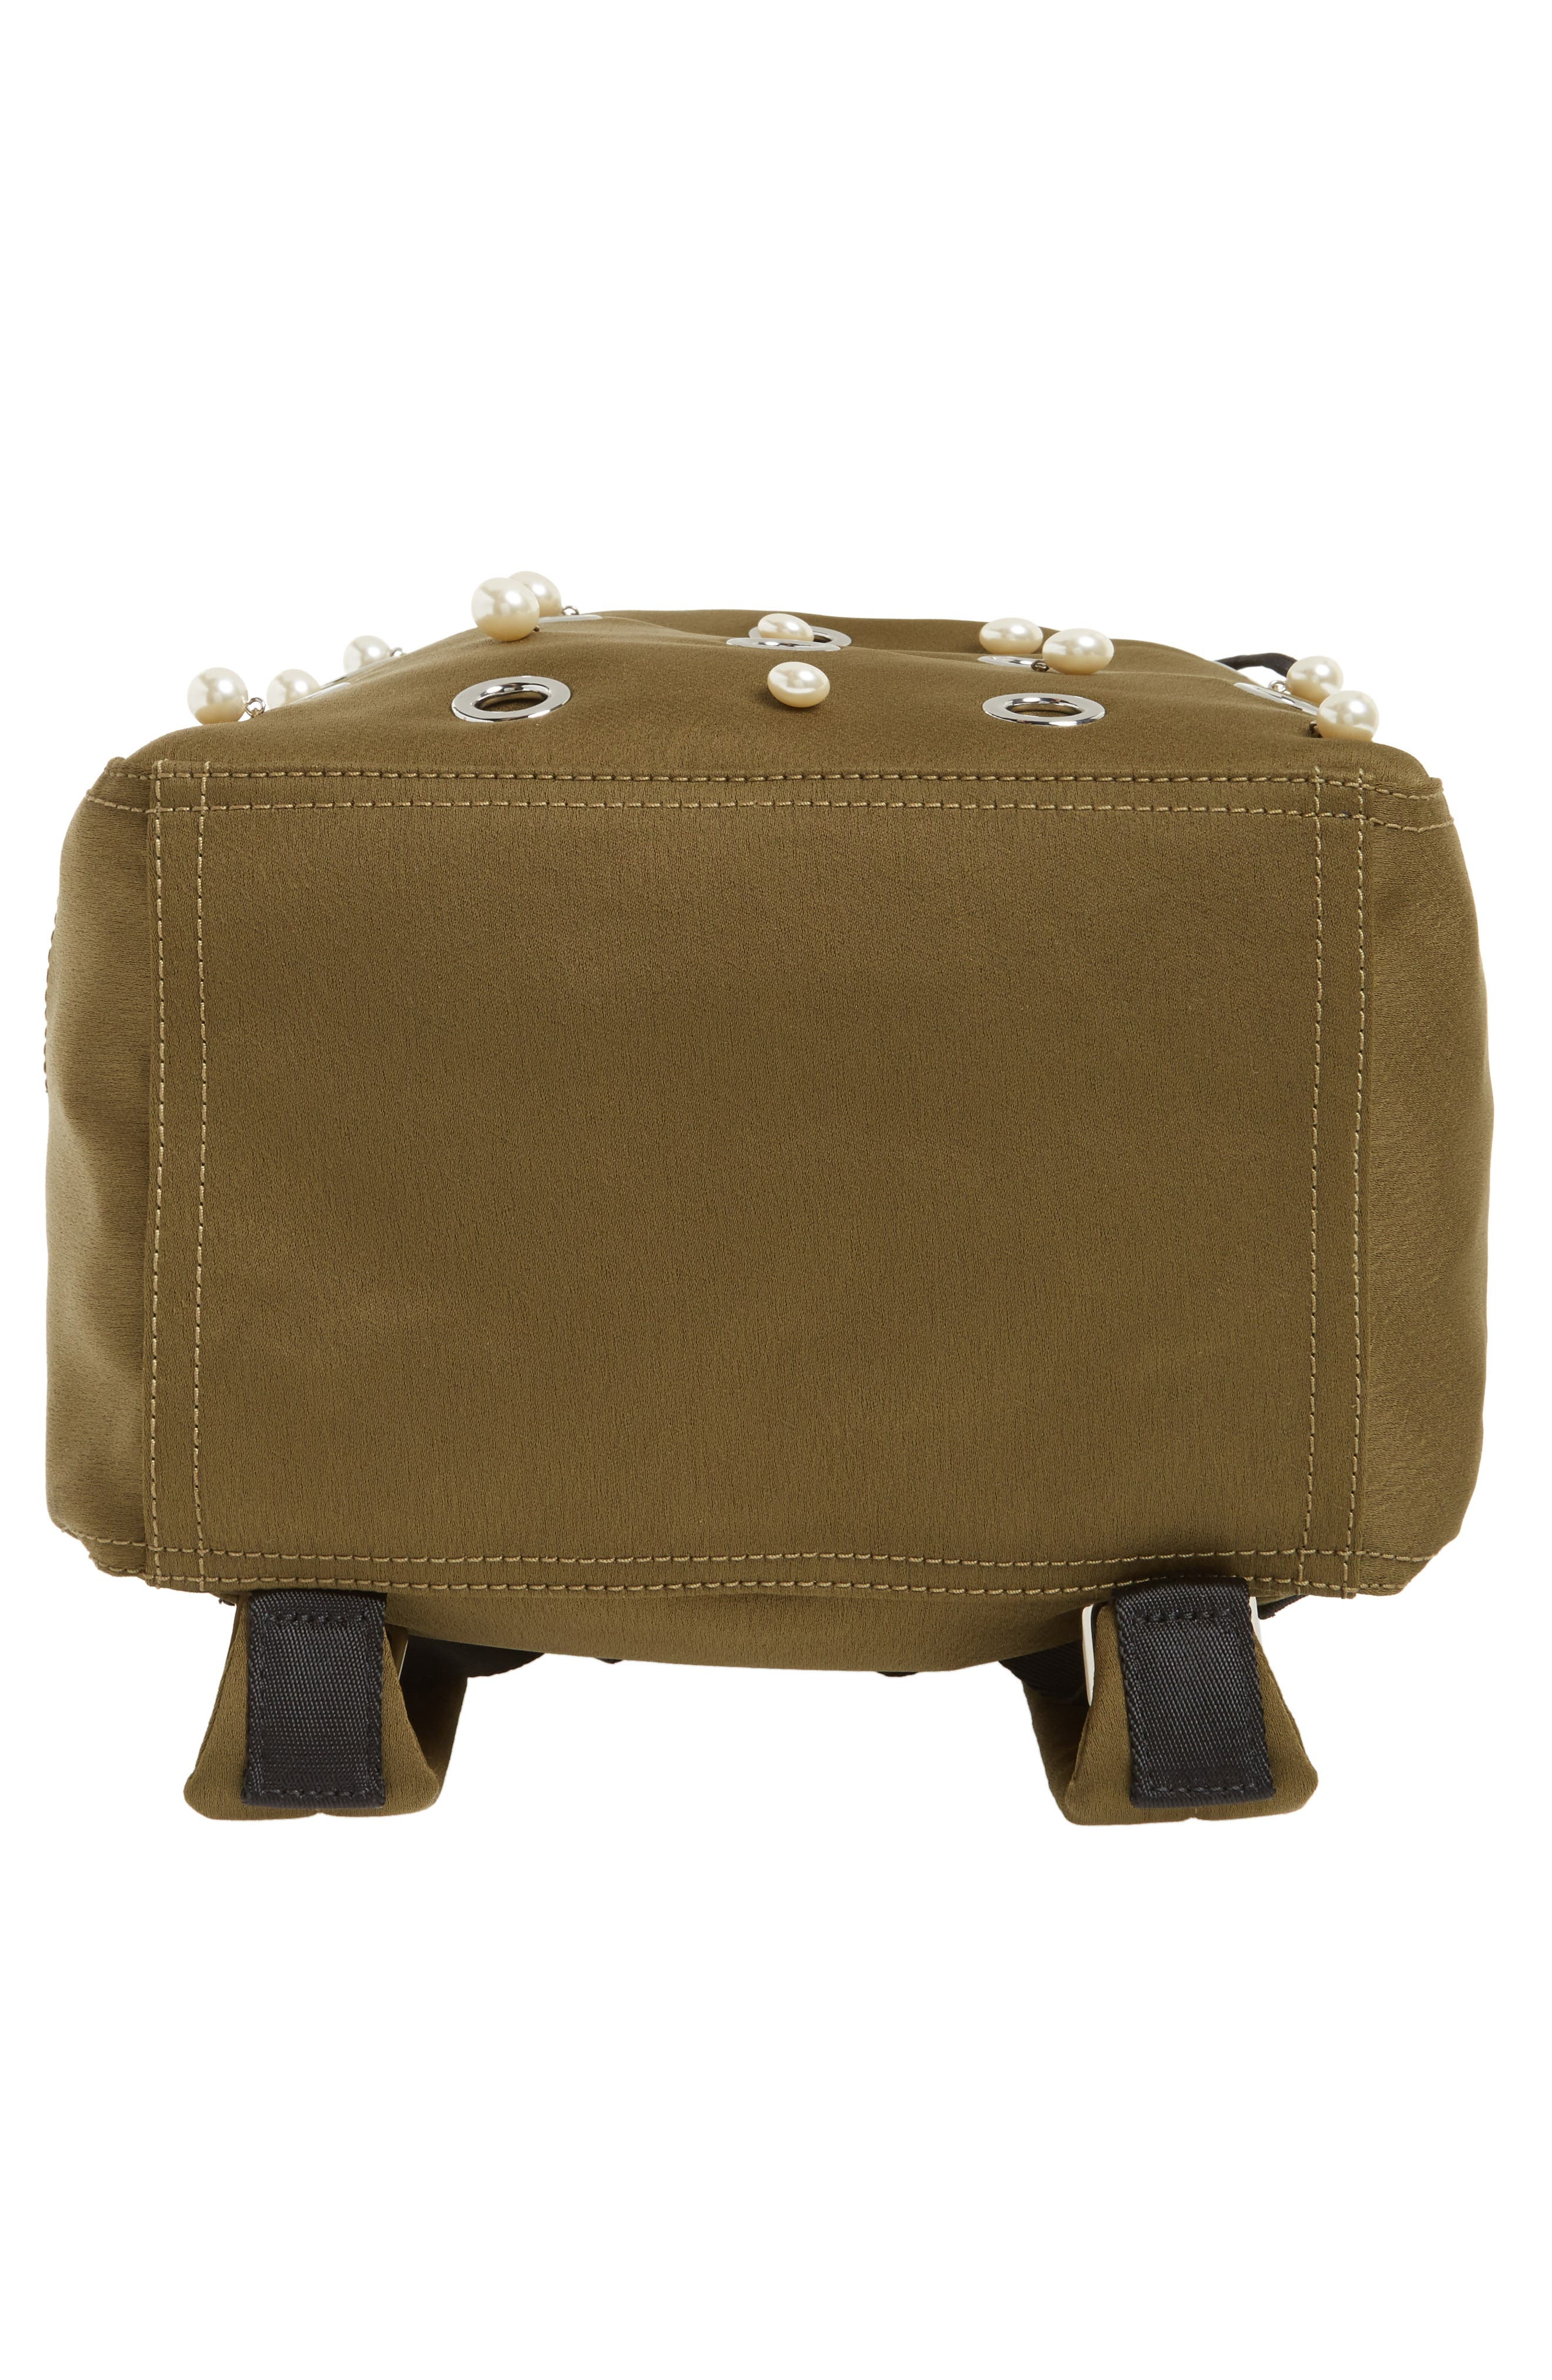 Phillip Lim 3.1 Medium Go-Go Embellished Backpack,                             Alternate thumbnail 6, color,                             301